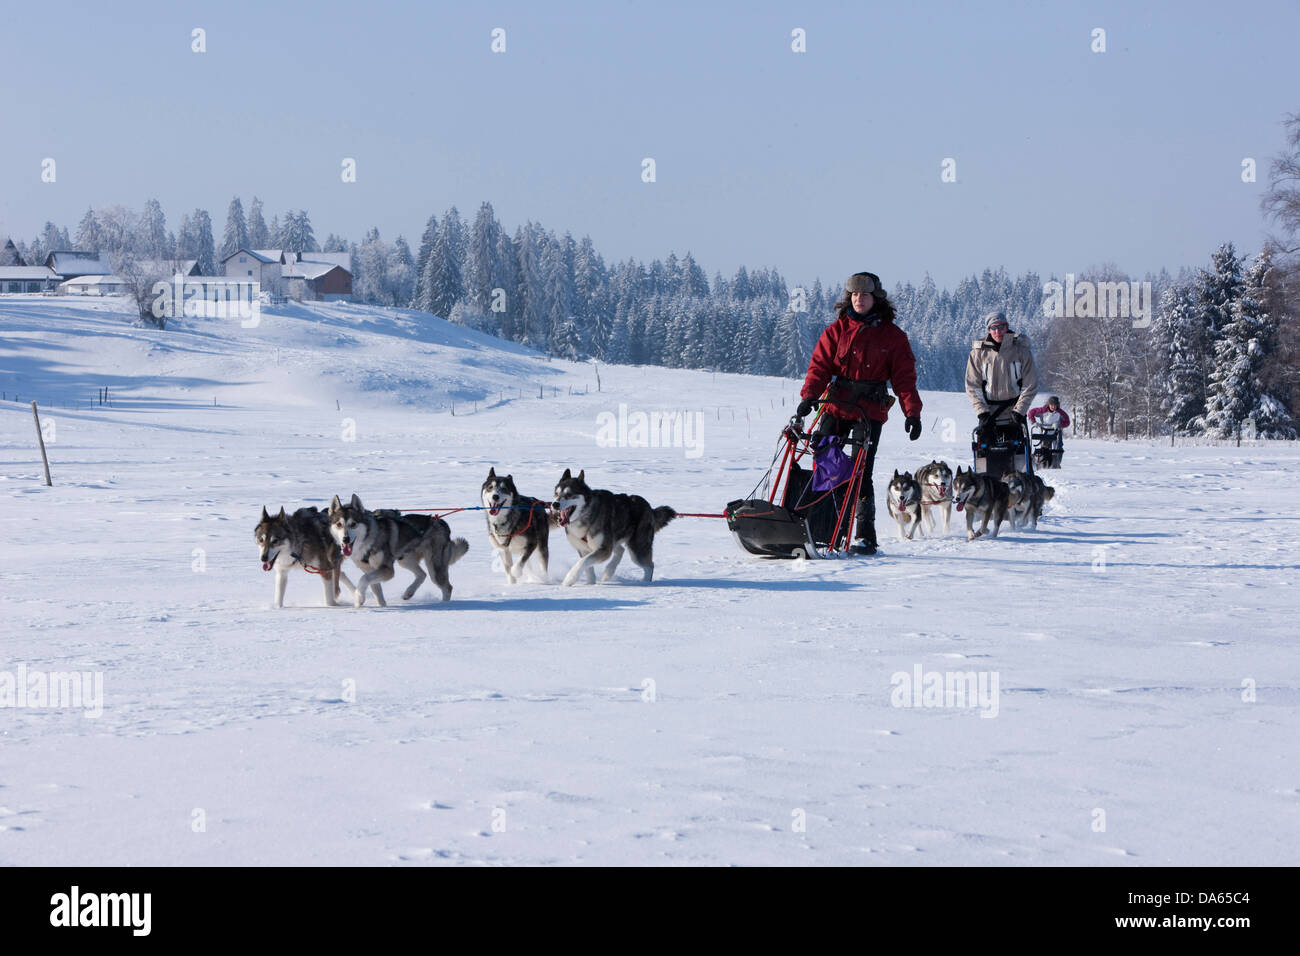 Sledge dogs, tour, Jura, winter, canton, JU, Jura, winter sports, animals, animal, dog, polar dog, sledge dog, Switzerland, - Stock Image